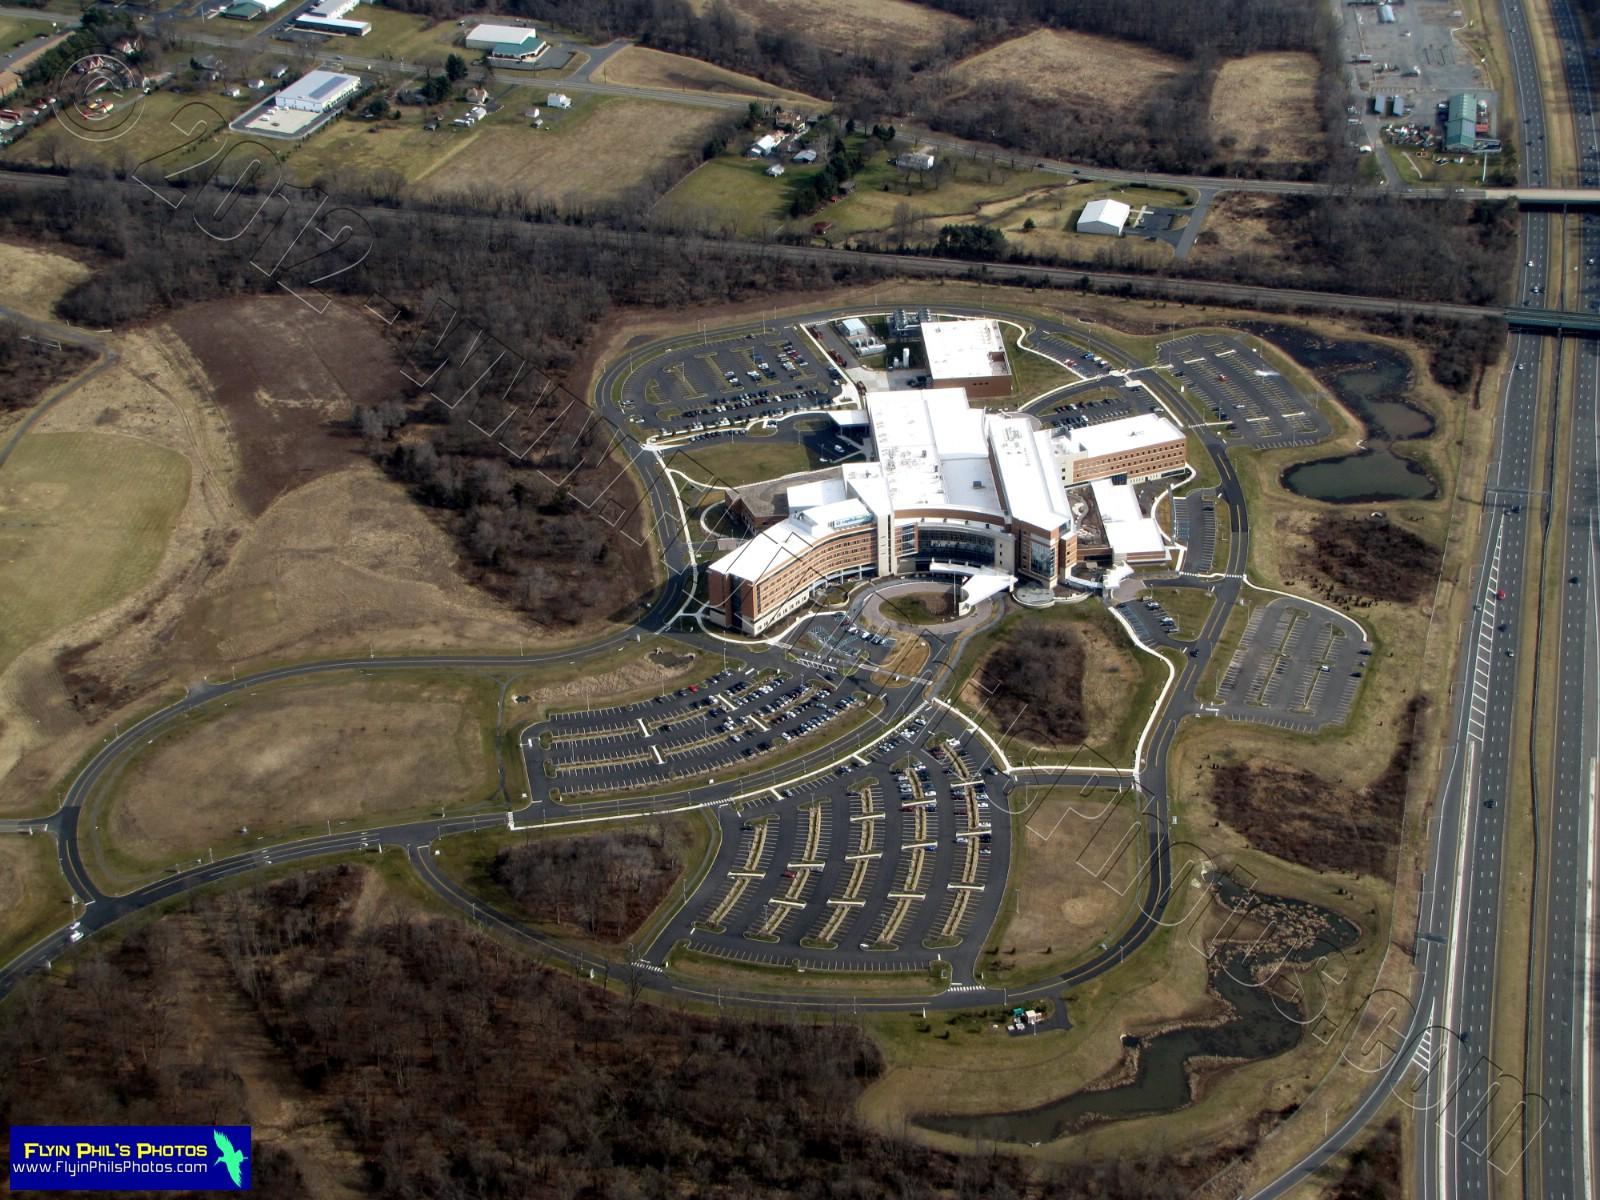 Parking trenton airport - Southfield theater movie times